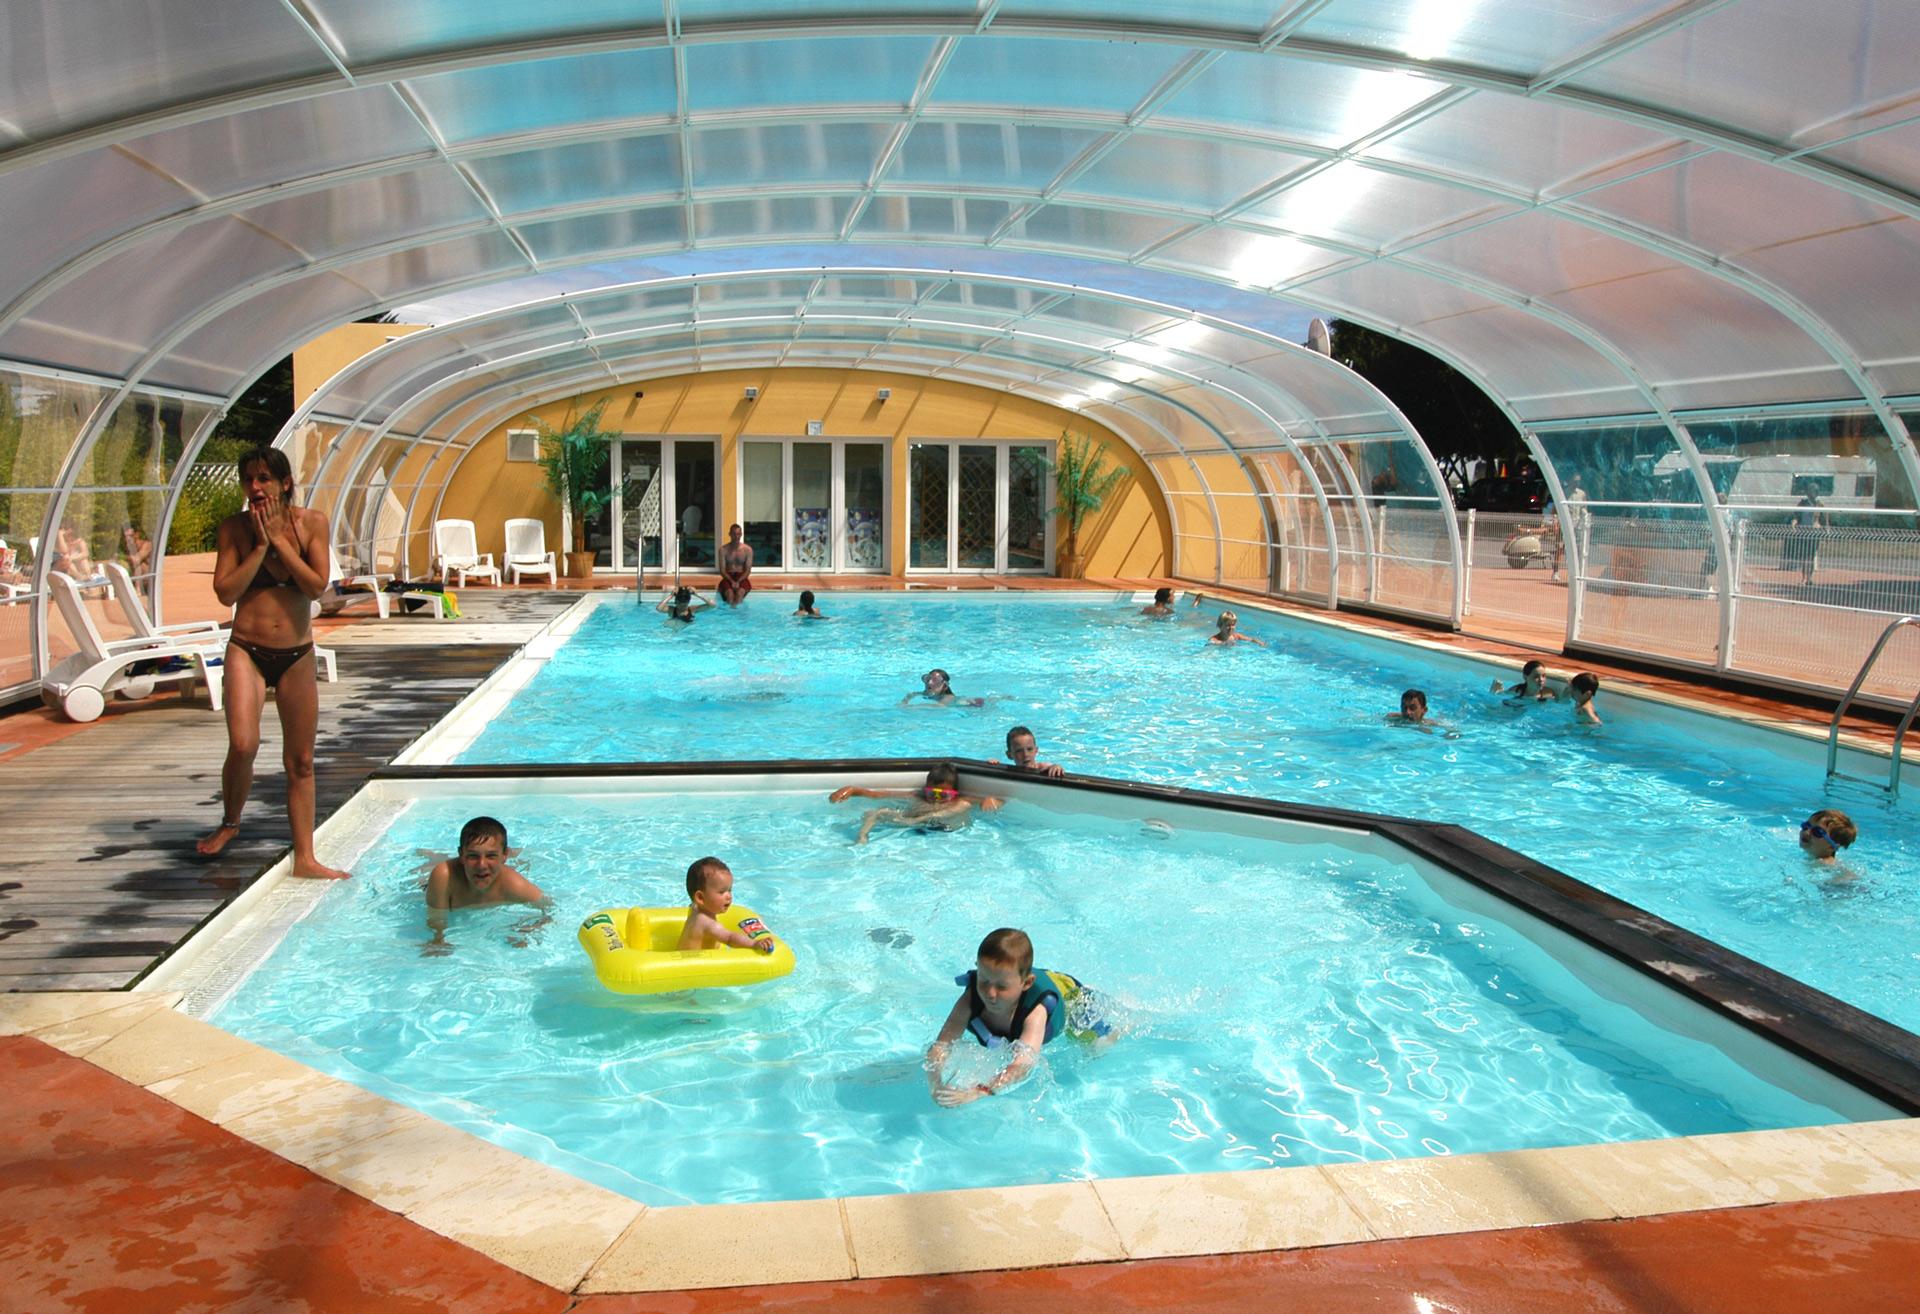 Int piscine couverte camping eleovic - Camping gerardmer piscine couverte ...